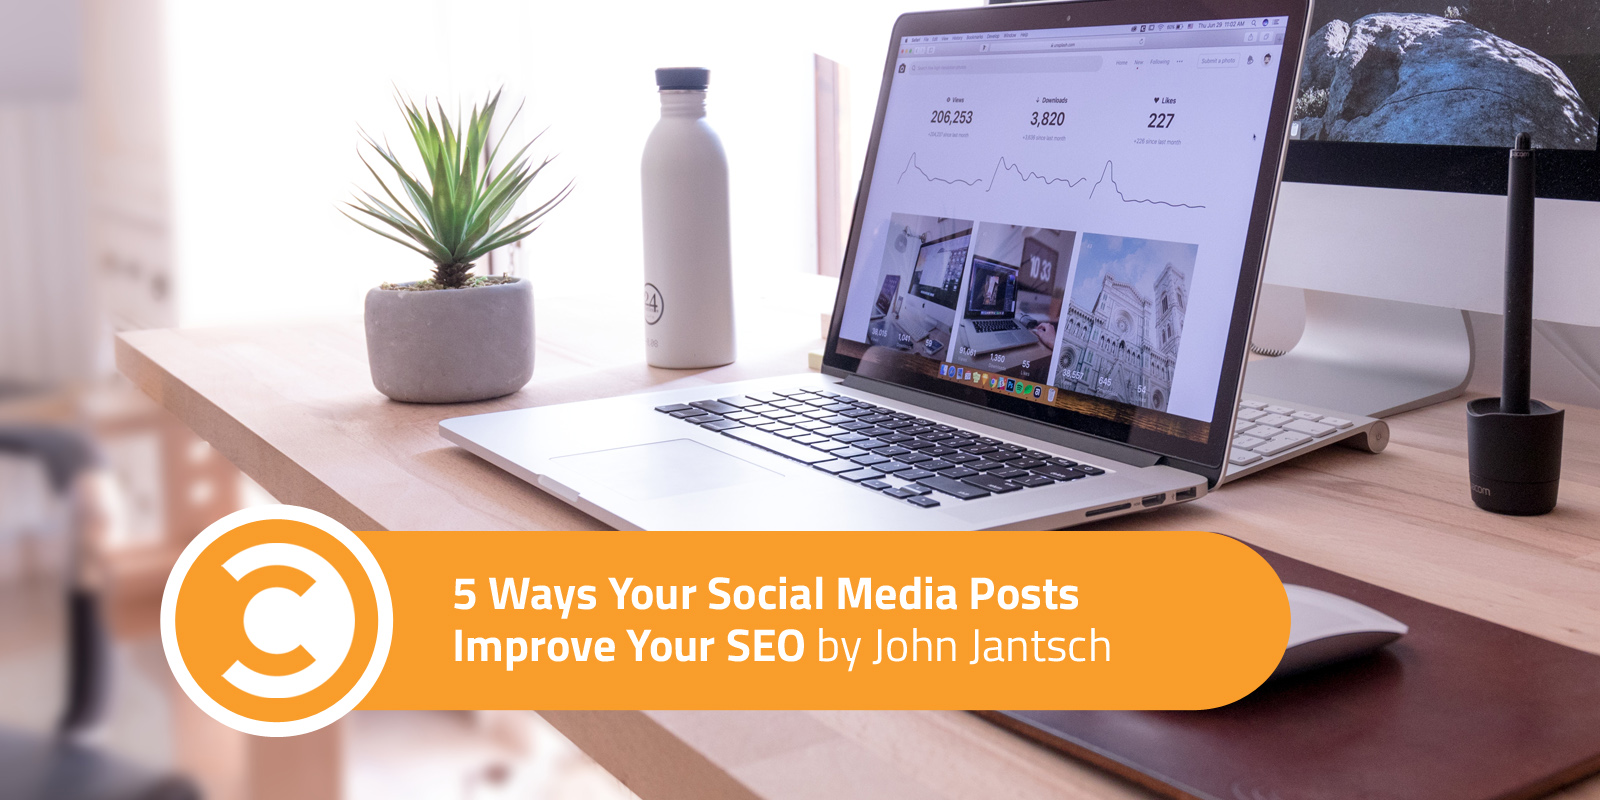 5 Ways Your Social Media Posts Improve Your SEO